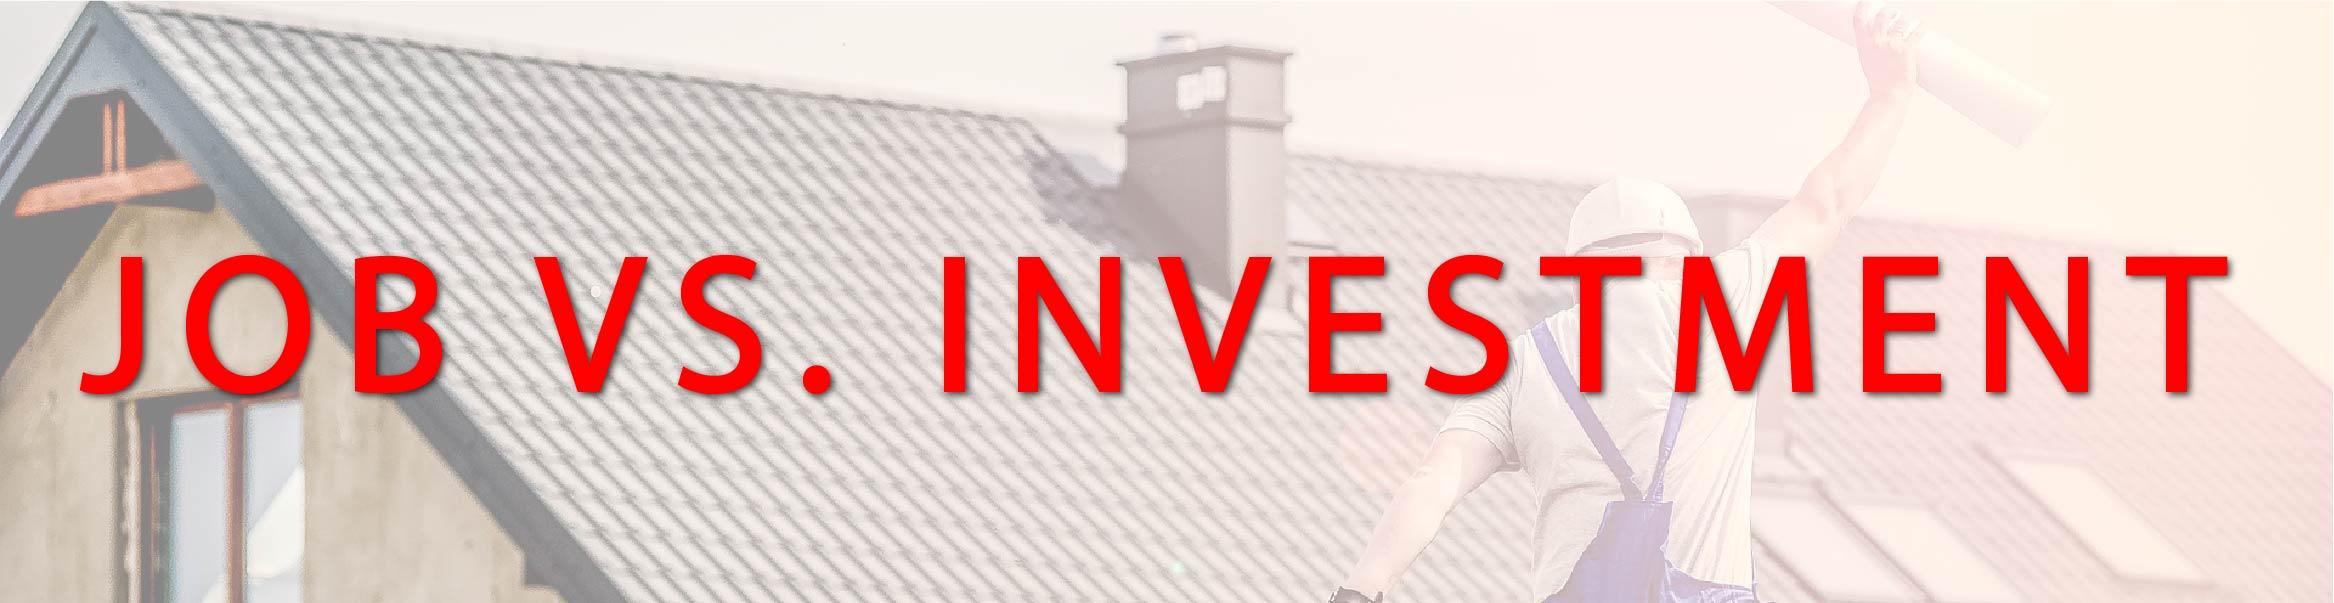 Job VS. Investment - Cogo Capital